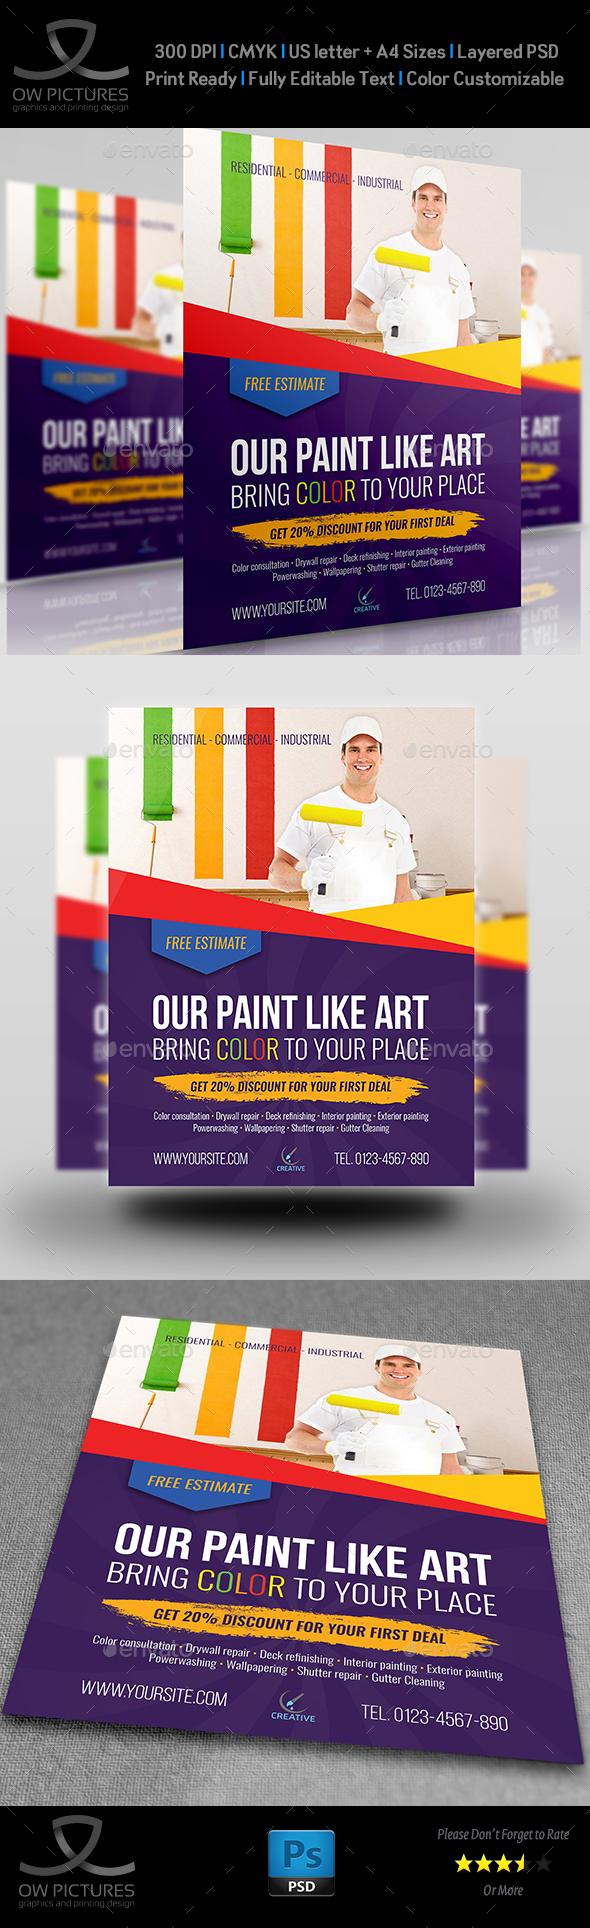 Painter Flyer Template - Flyers Print Templates